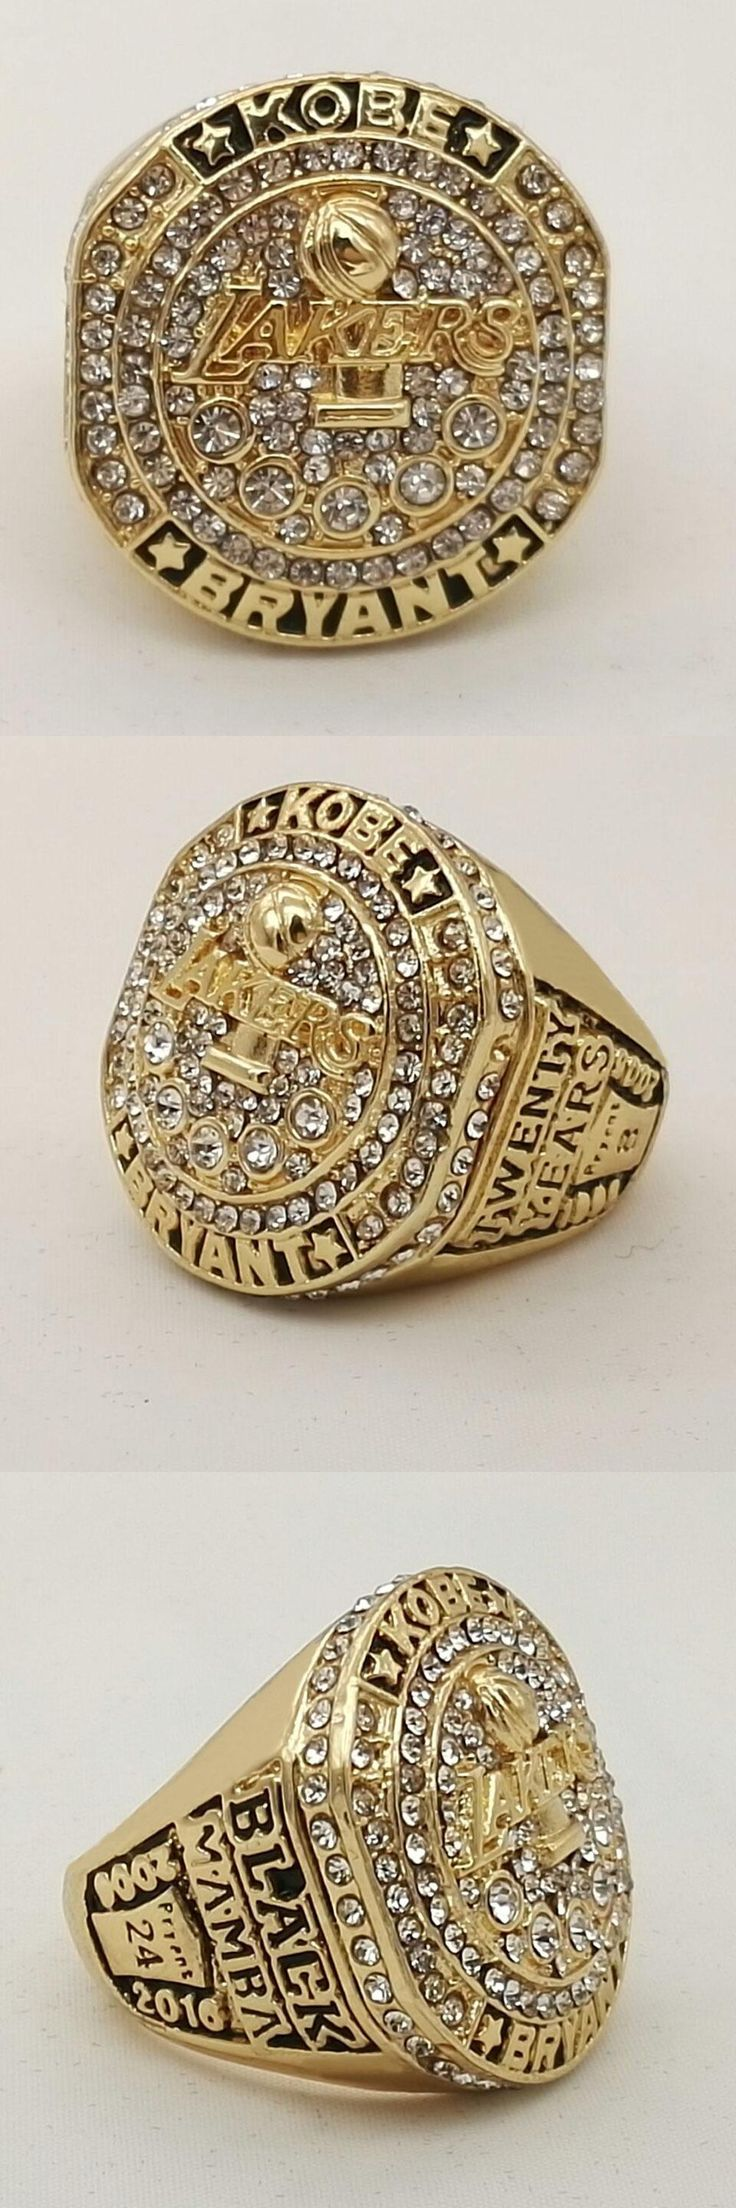 [Visit to Buy] Wholesale 2016 fashion free shipping Kobe Present Kobe Bryant with Retirement Ring twenty years black mamba replica ring #Advertisement